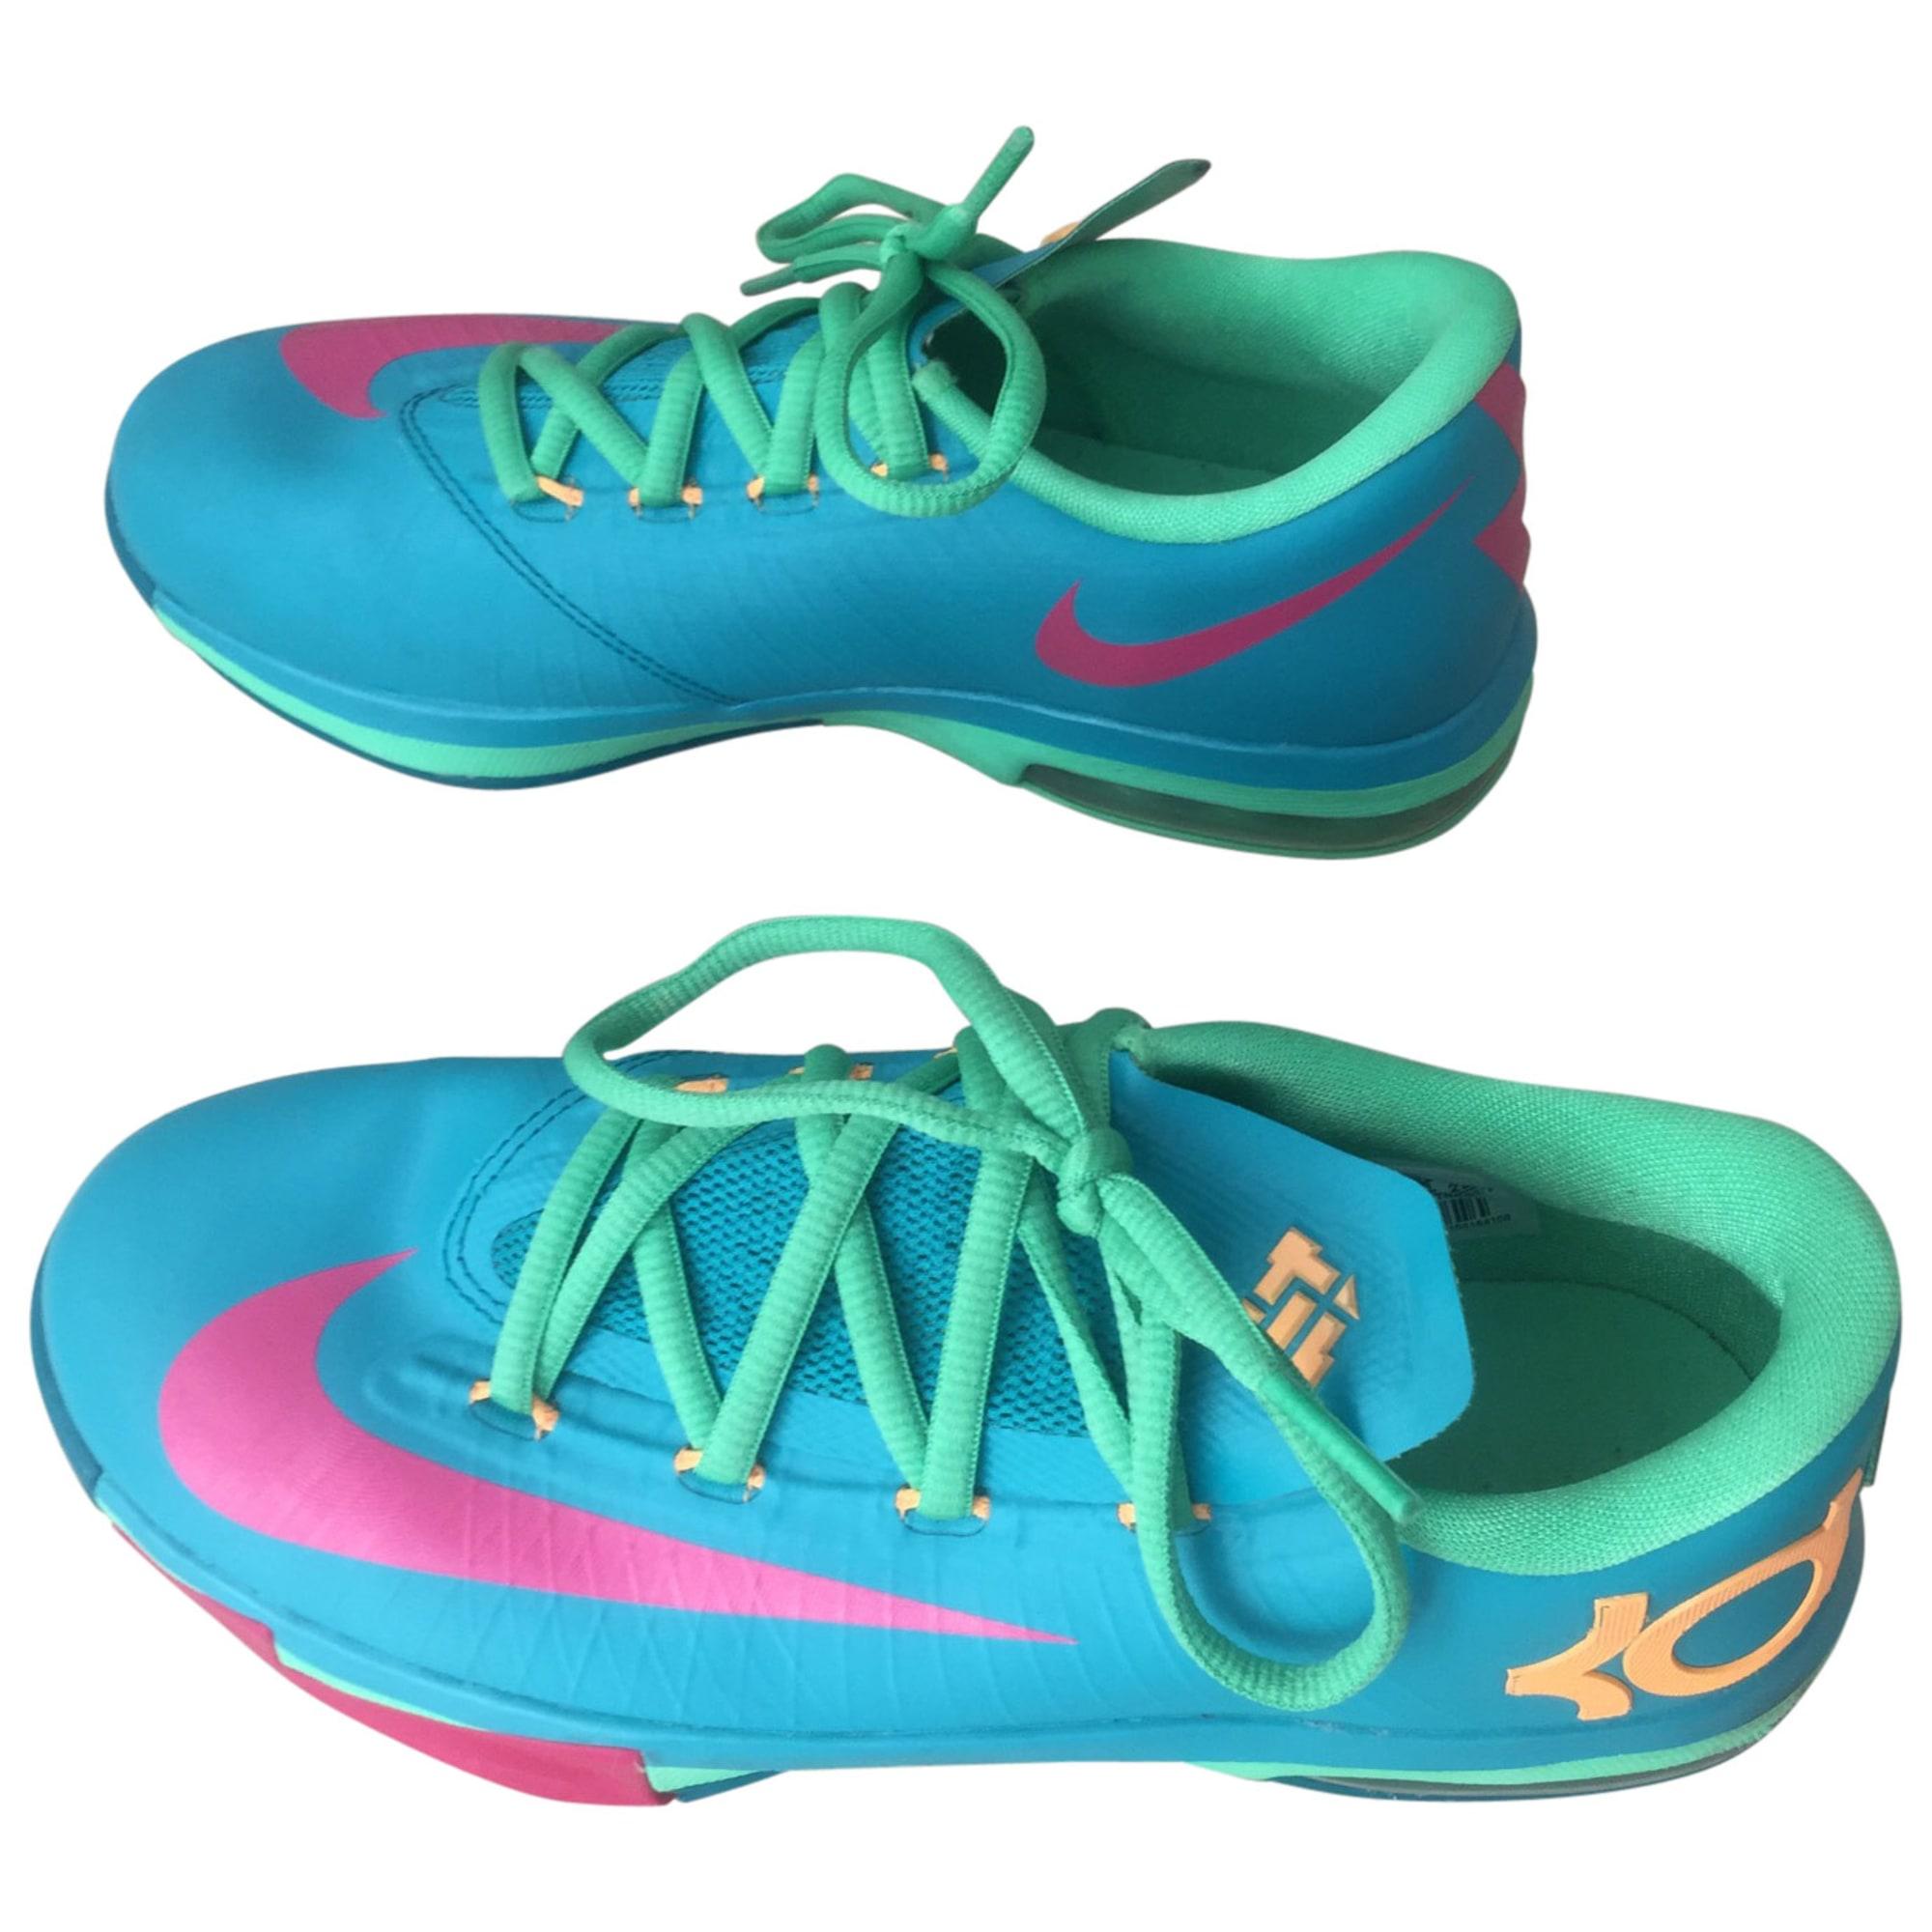 Bleu Sport Autre De Nike 3479916 Chaussures CwxRH0nqC